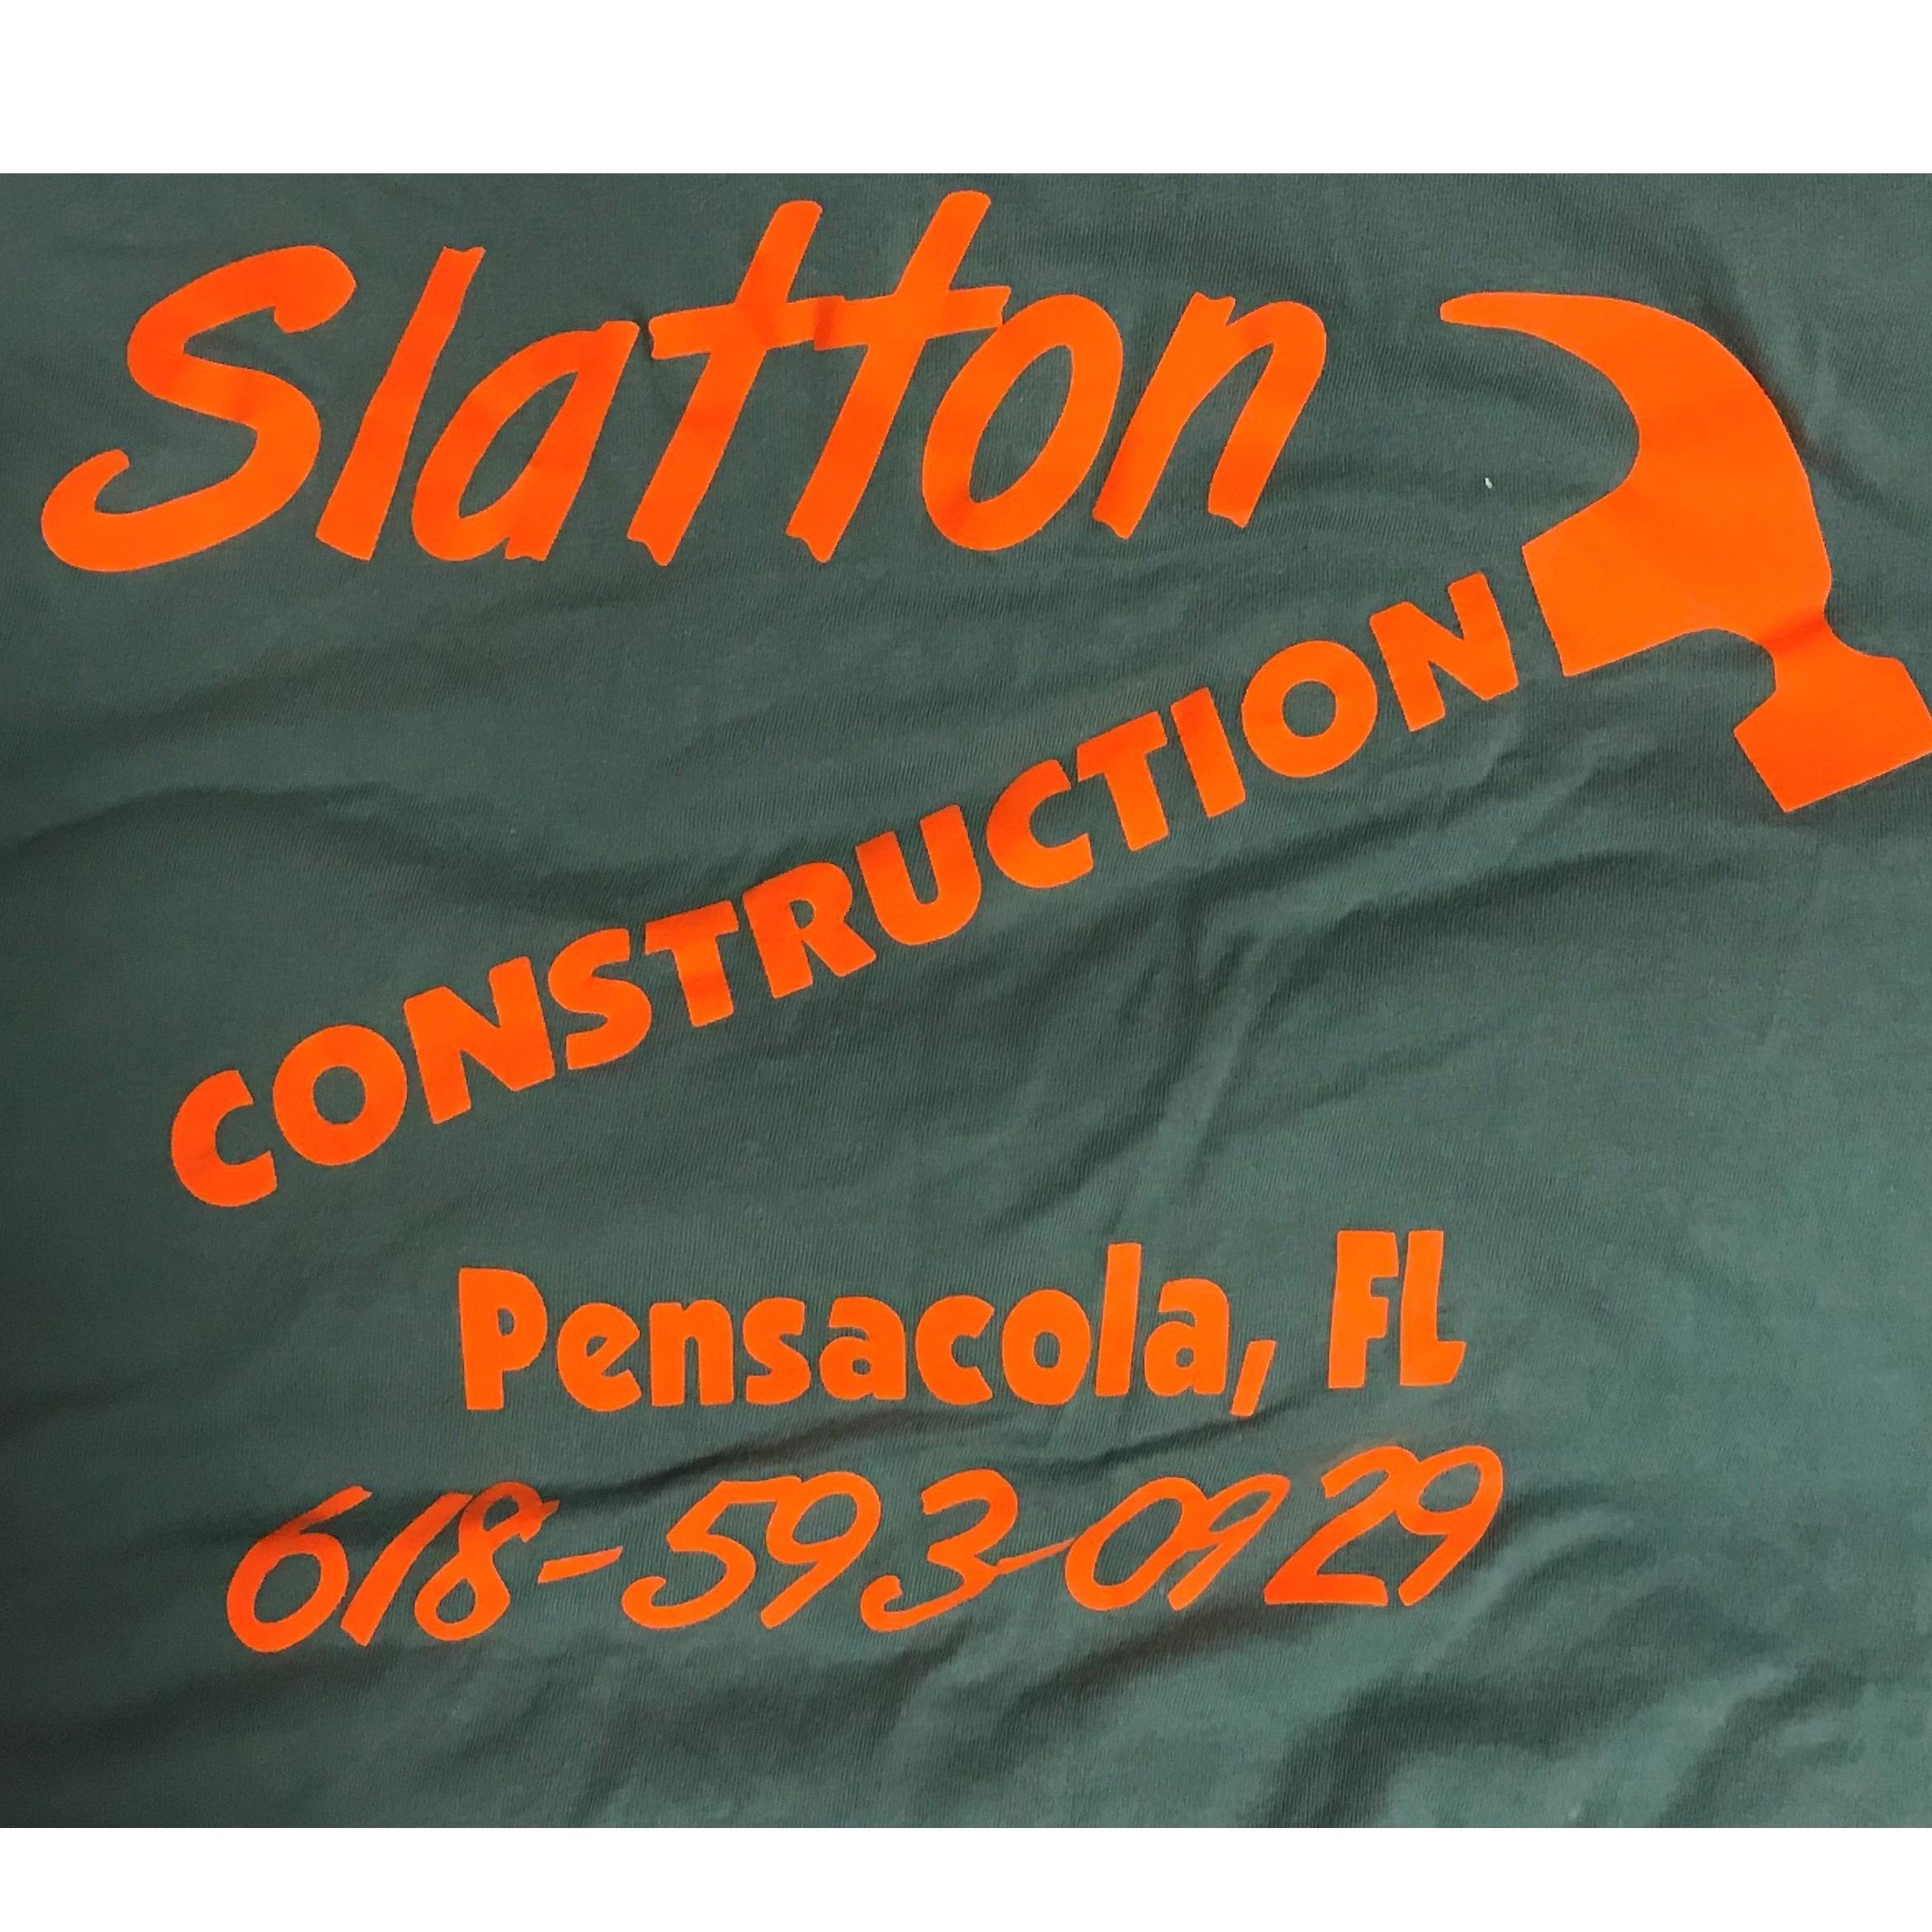 Slatton Construction LLC image 11